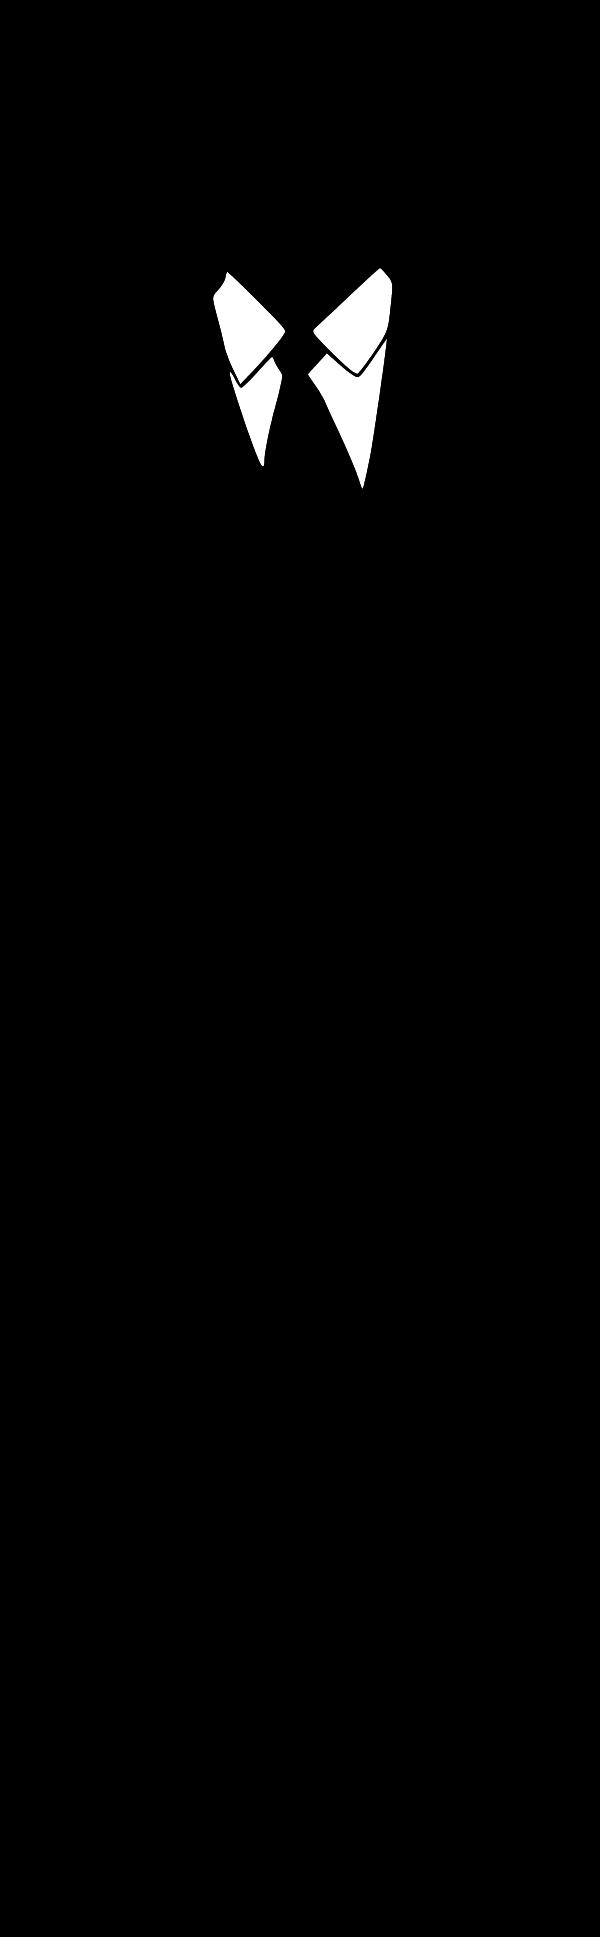 Clipart man black and white. Men silhouette clip art